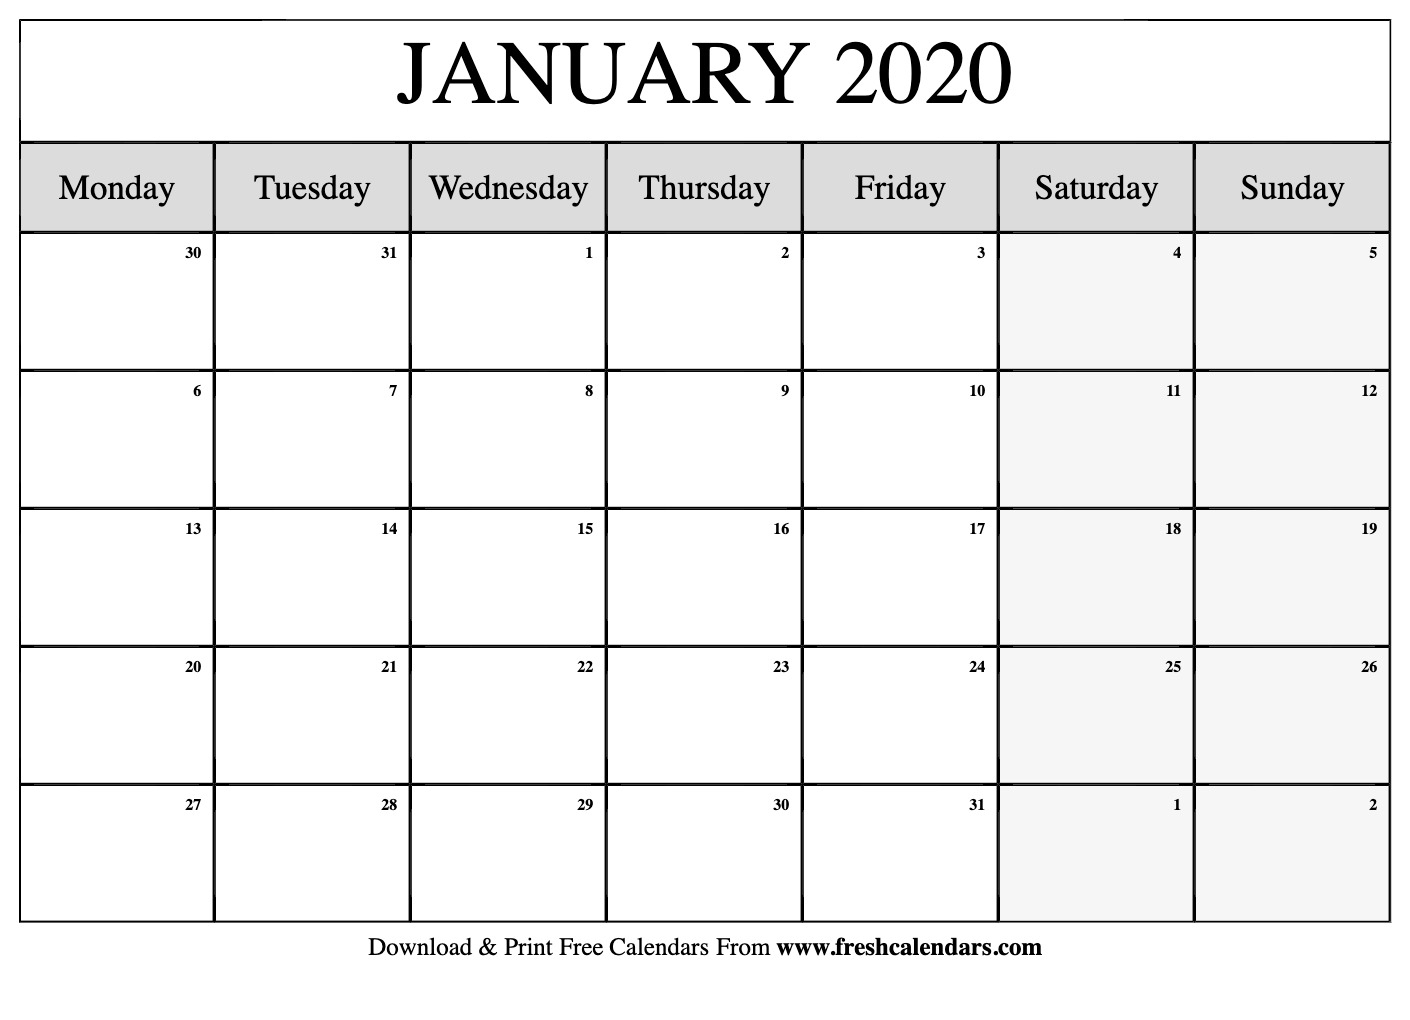 Print 2020 Calendar 11x17 Calendar Printables Free Templates 1